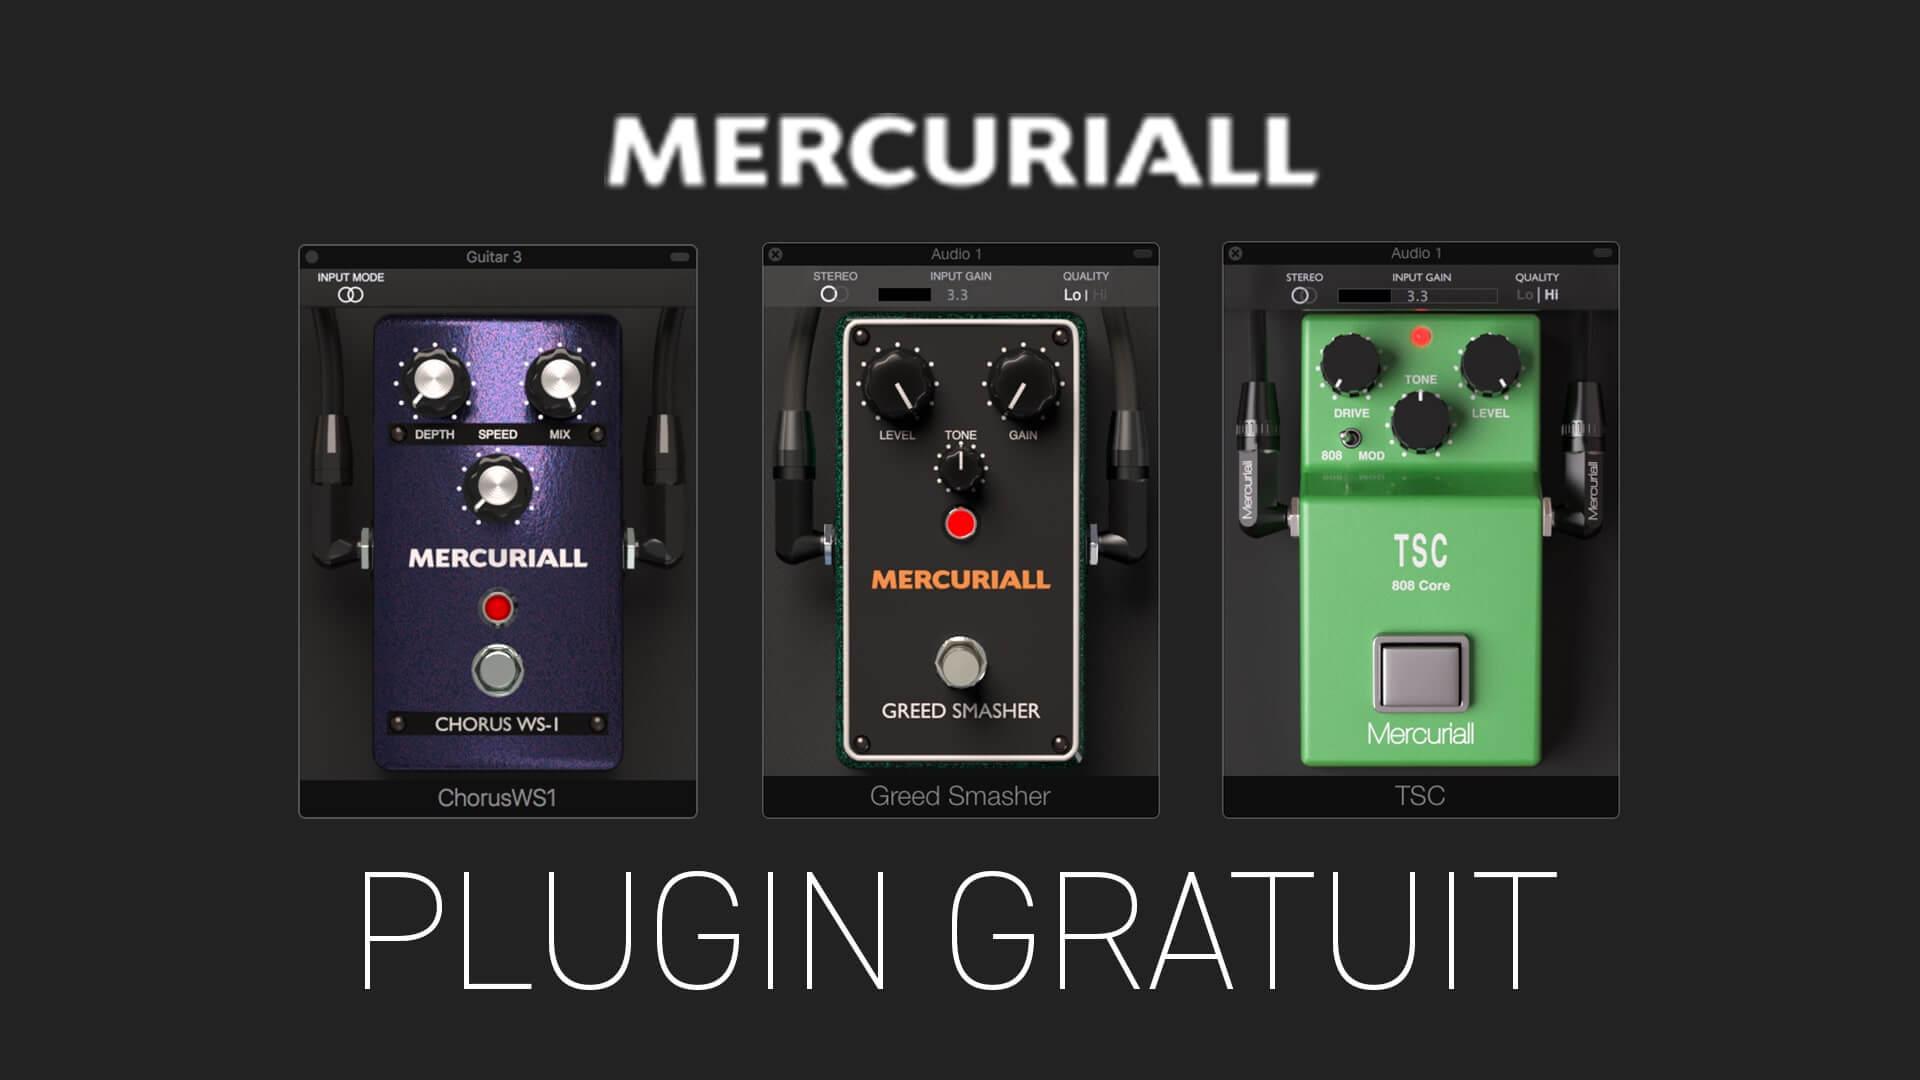 MERCURIALL Plugins Gratuits